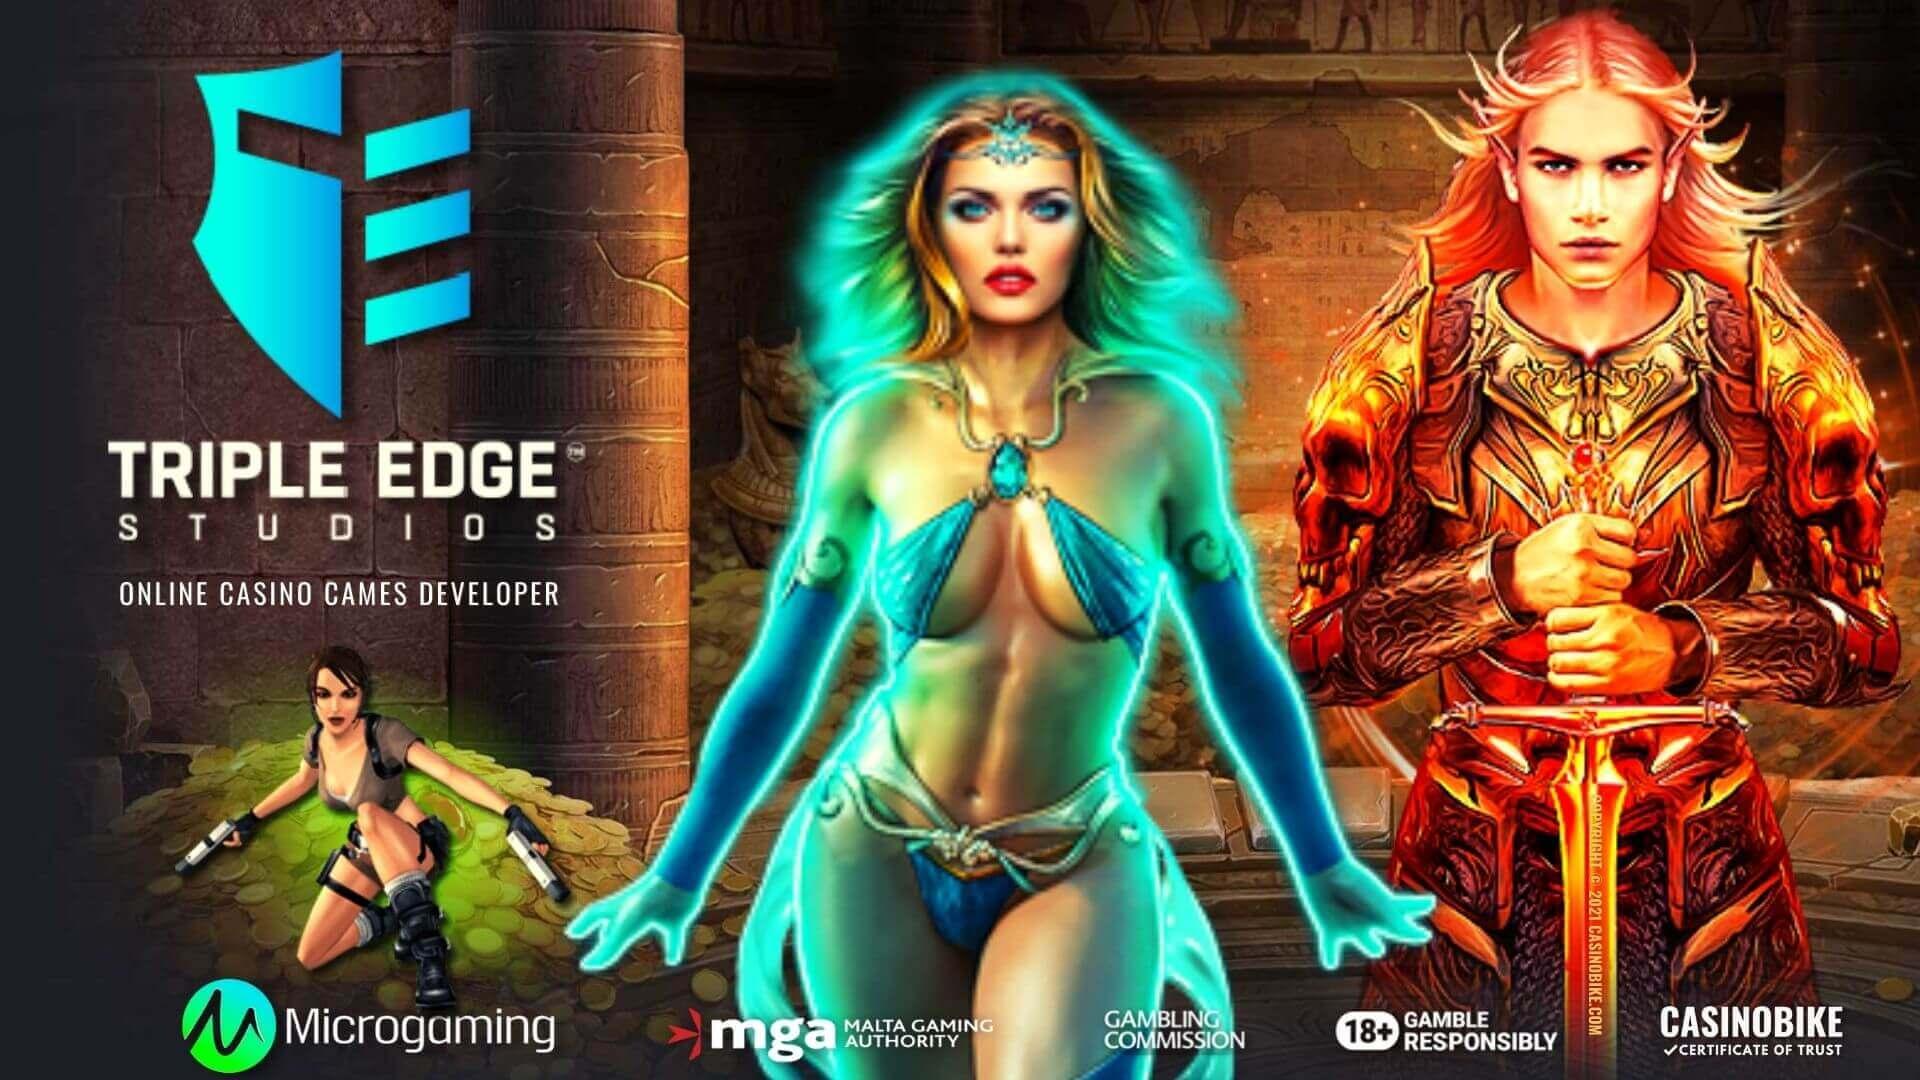 Triple Edge Studios Online Casino Software Developer